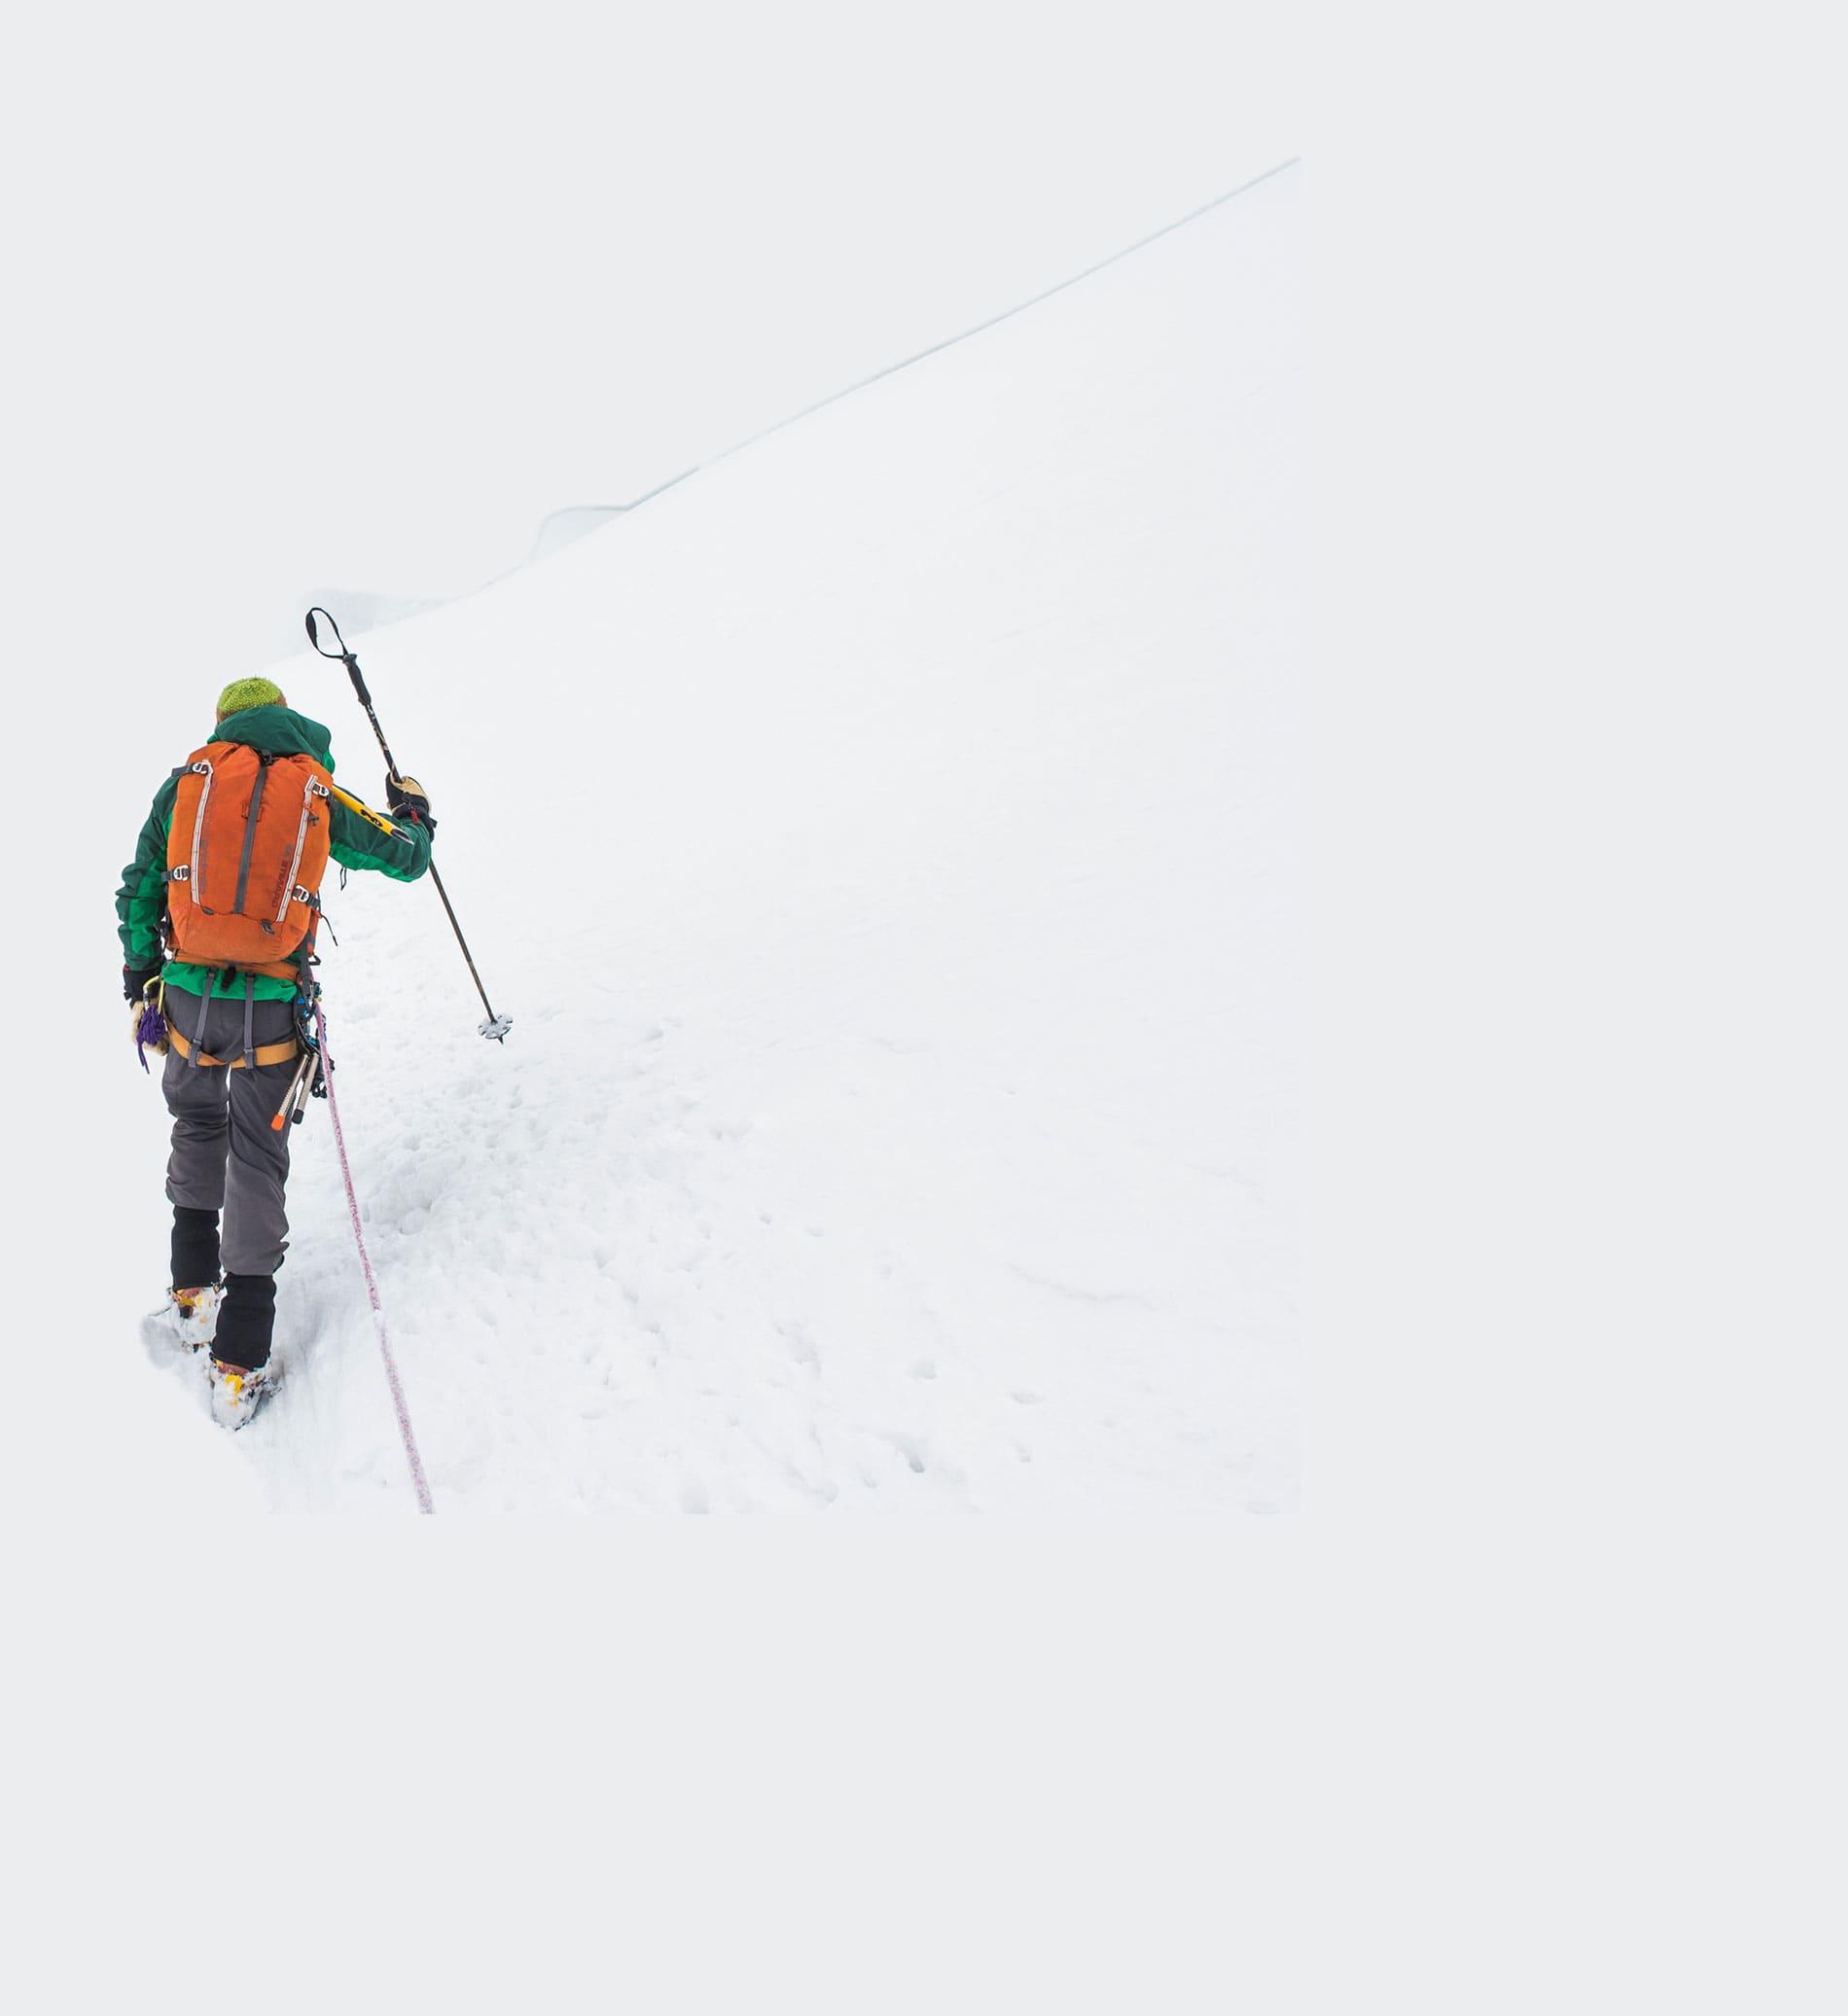 Hiking through the snow in the Cordillera Blanca